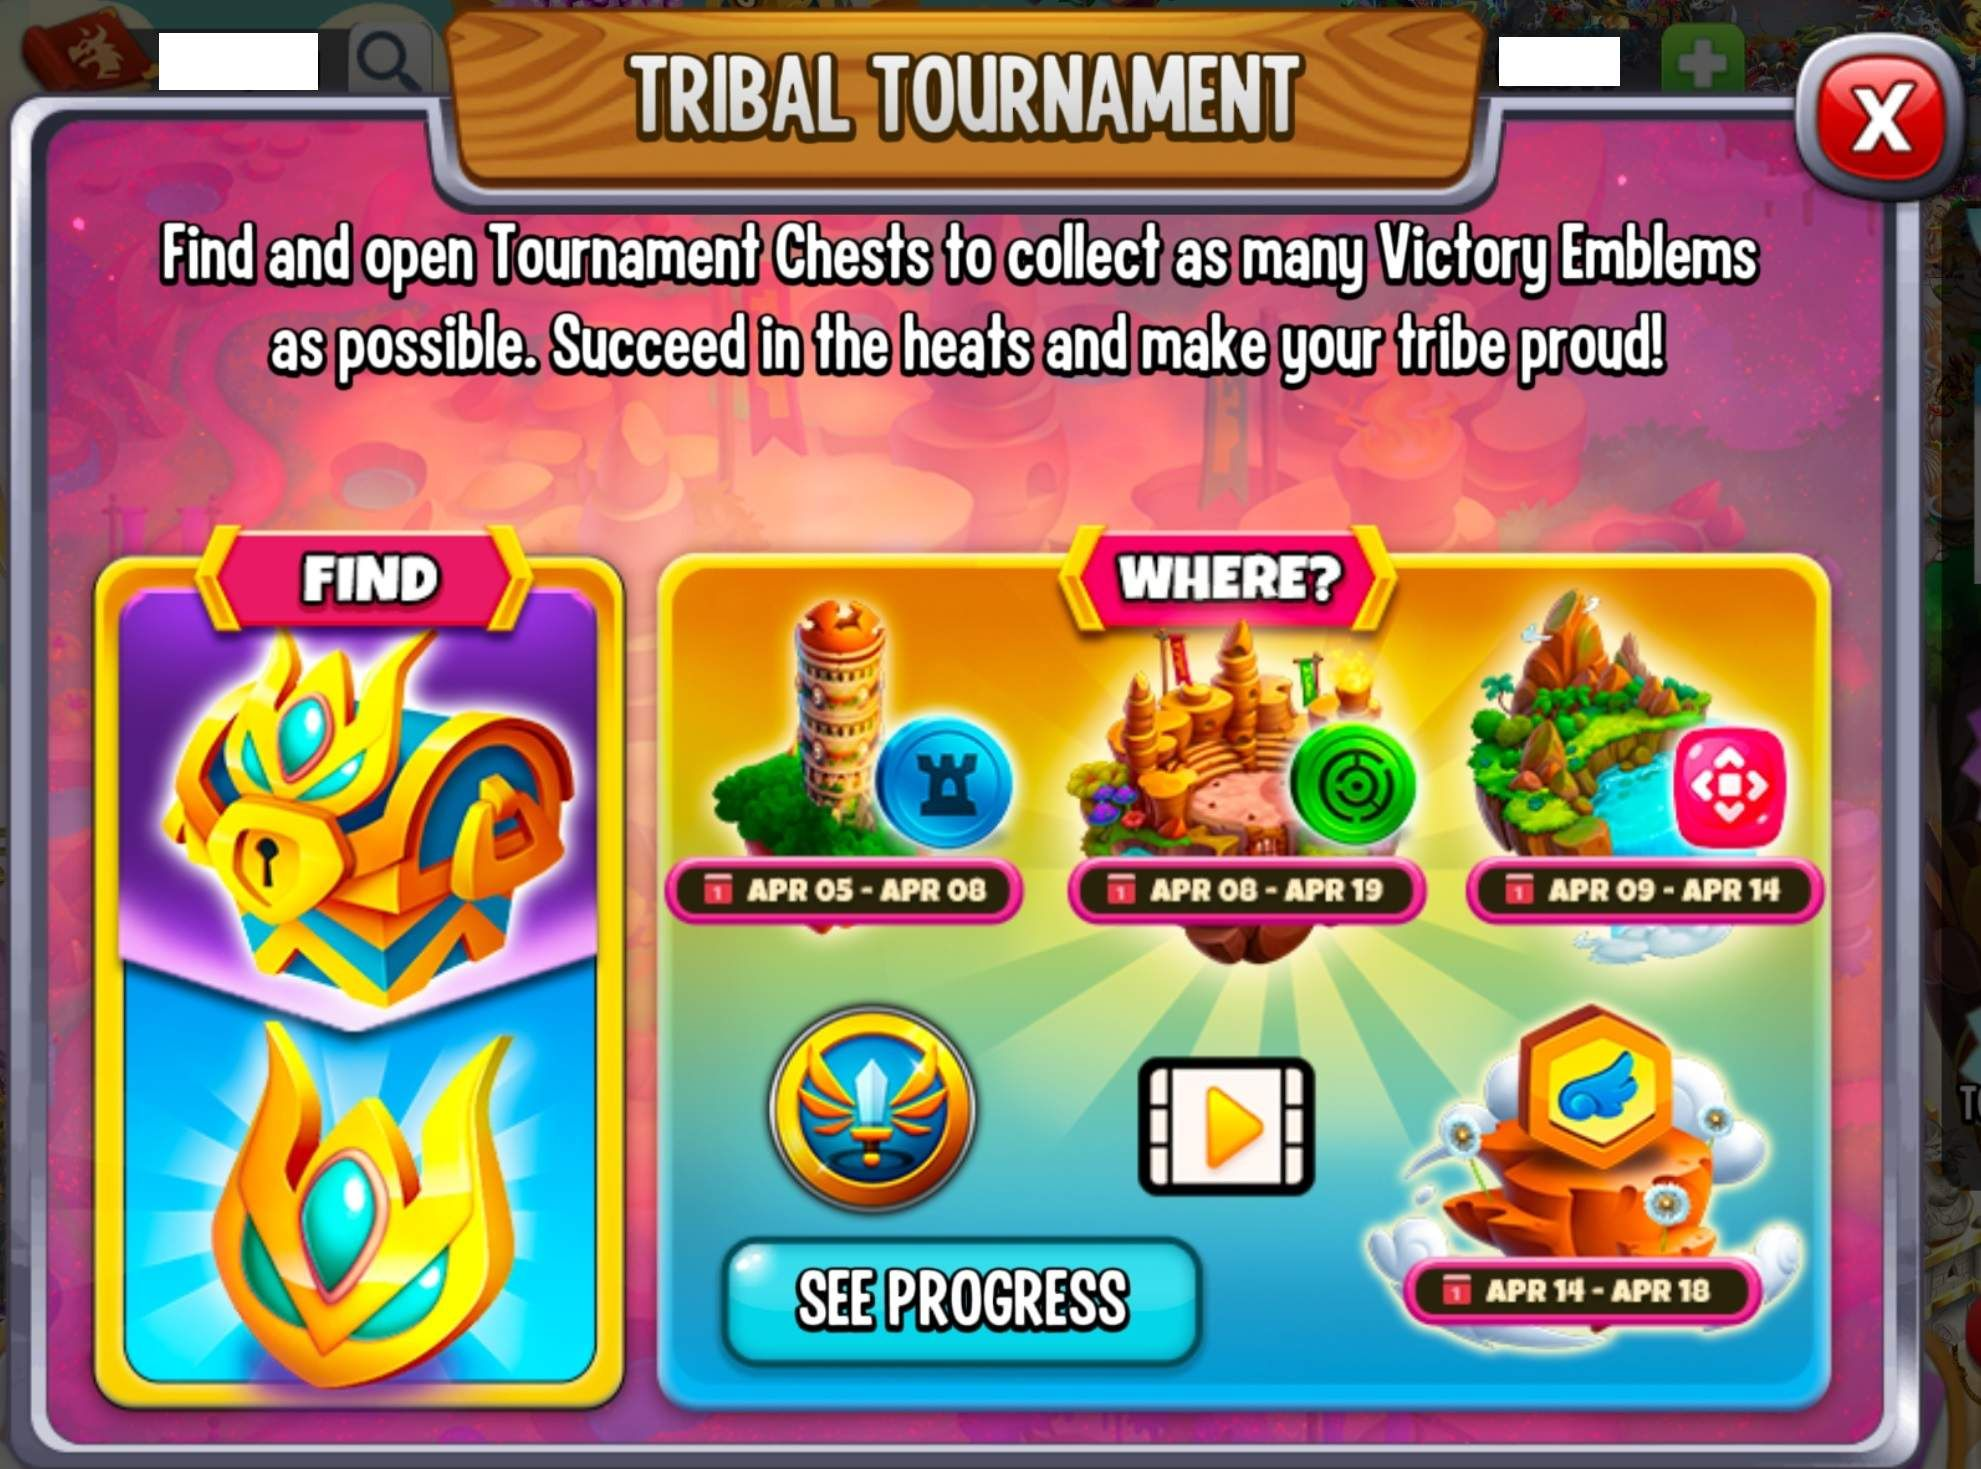 0_1617623482161_040521 Tribal Tournament.jpg